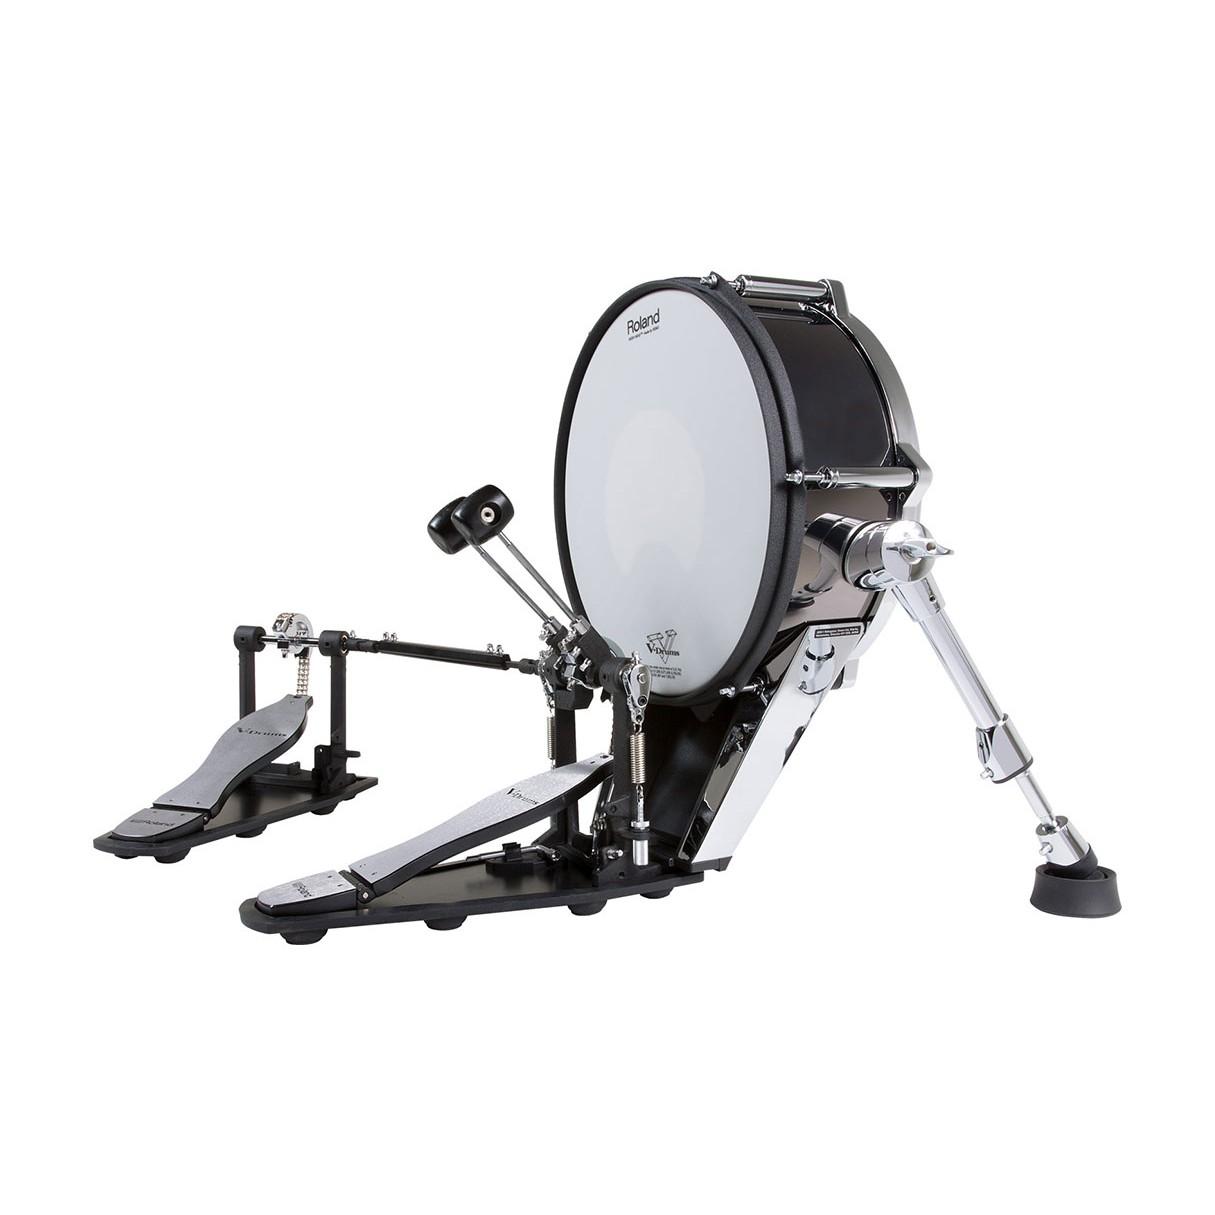 roland rdh102 noise eater double kick drum pedal. Black Bedroom Furniture Sets. Home Design Ideas